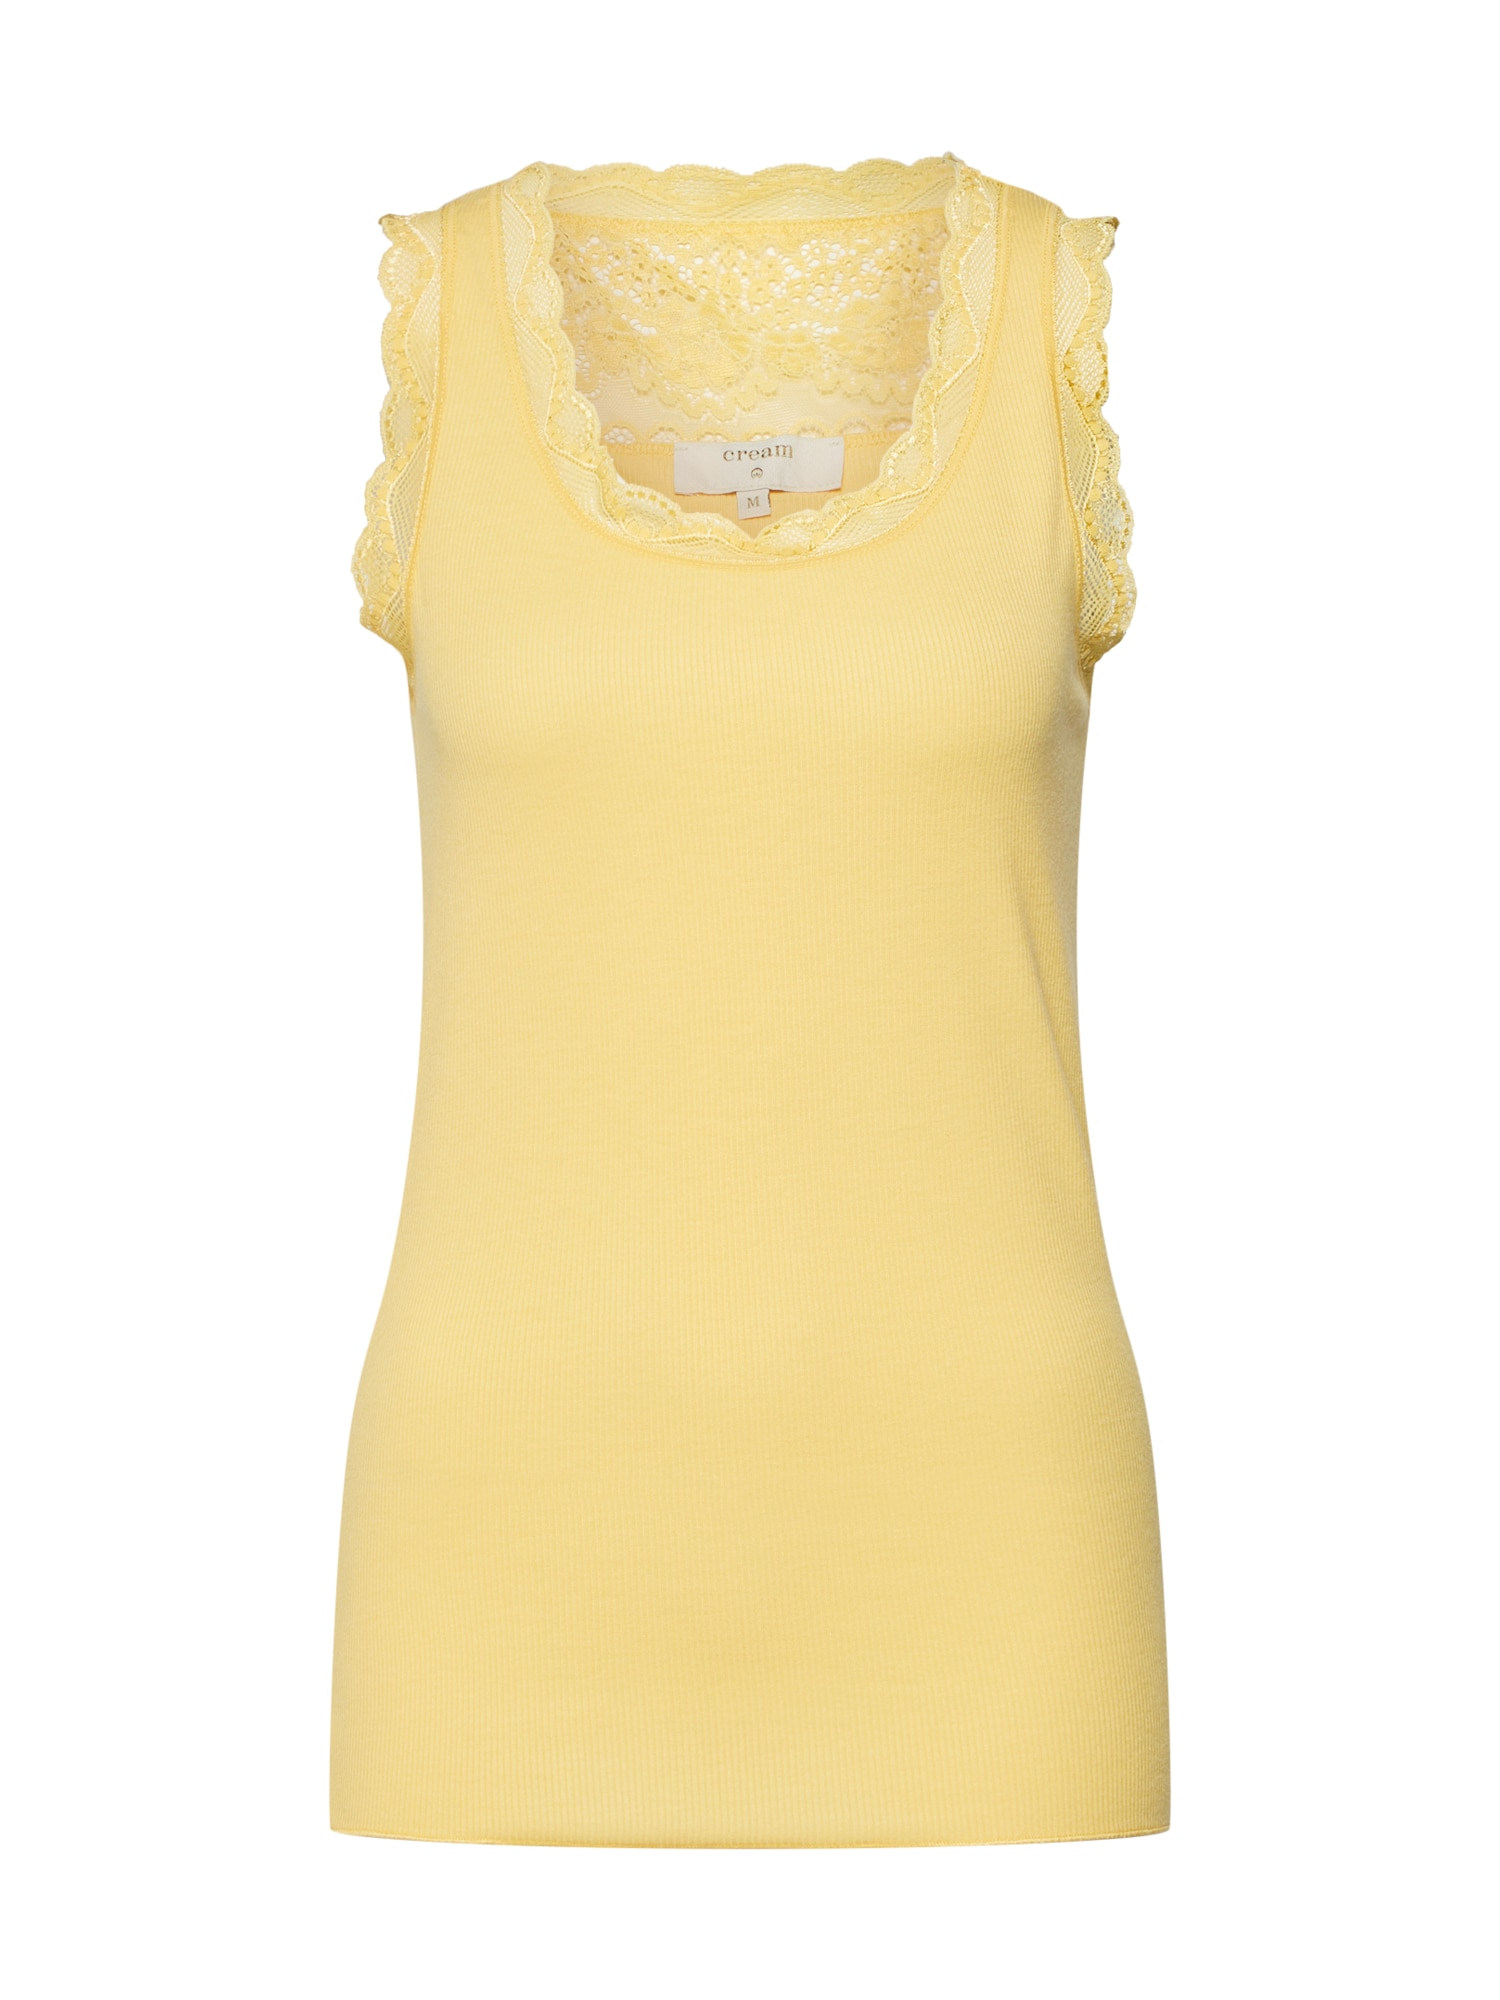 Top Vanessa zlatě žlutá Cream